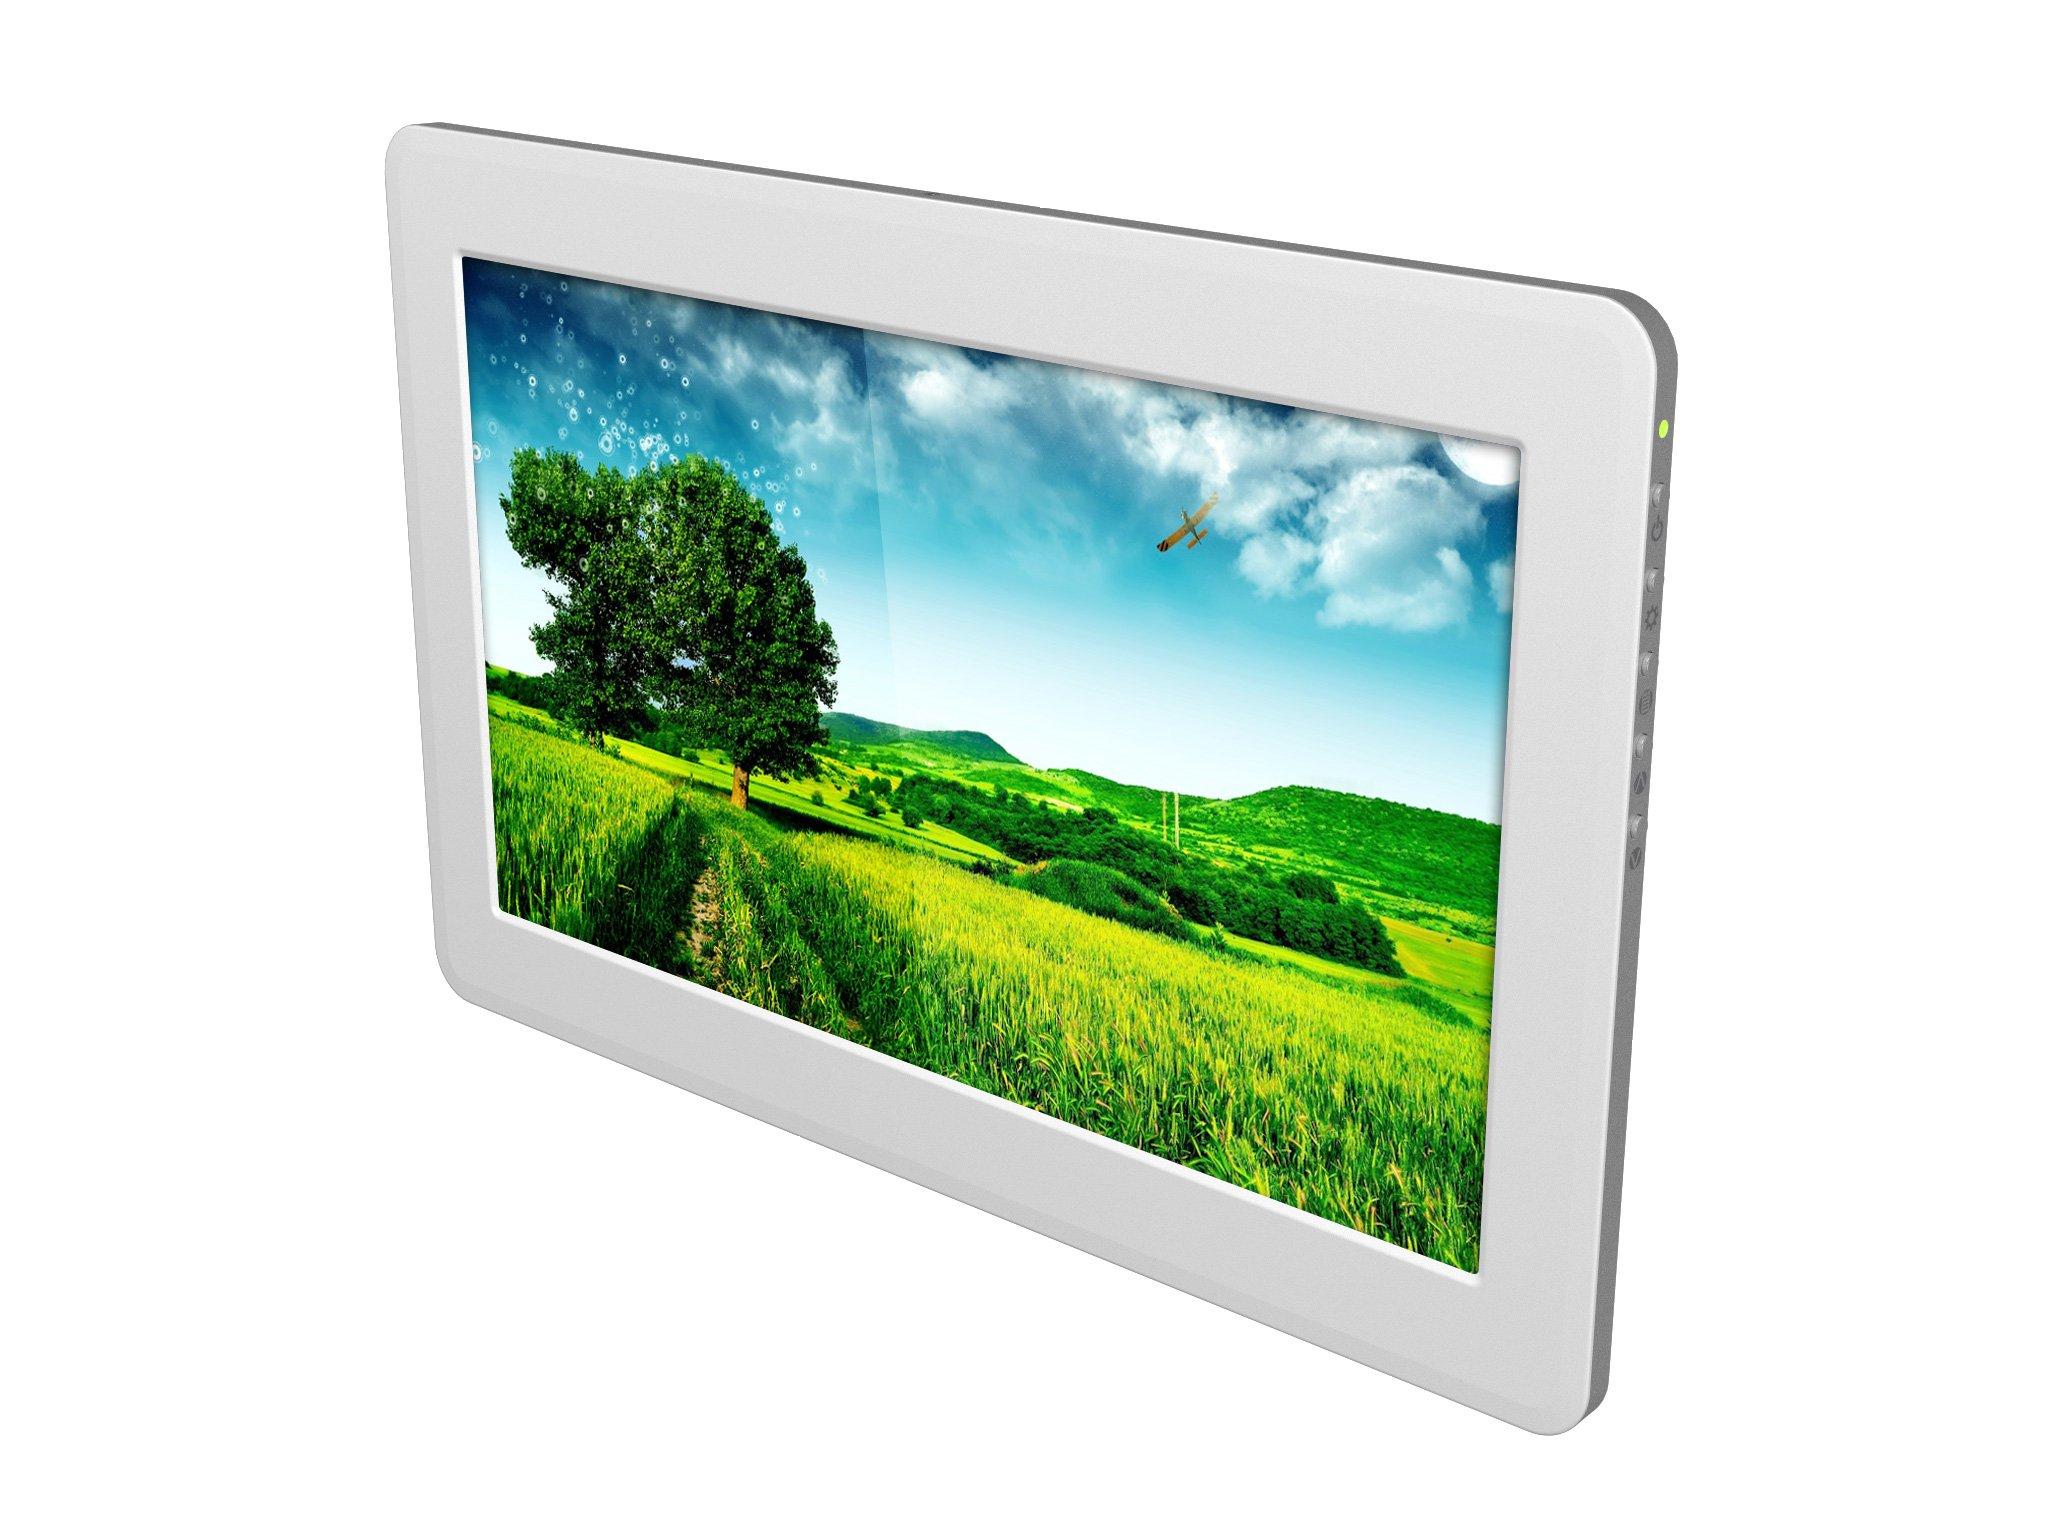 GeChic 1303H 13.3'' 1080p Portable Monitor with HDMI, VGA, MiniDisplay Inputs